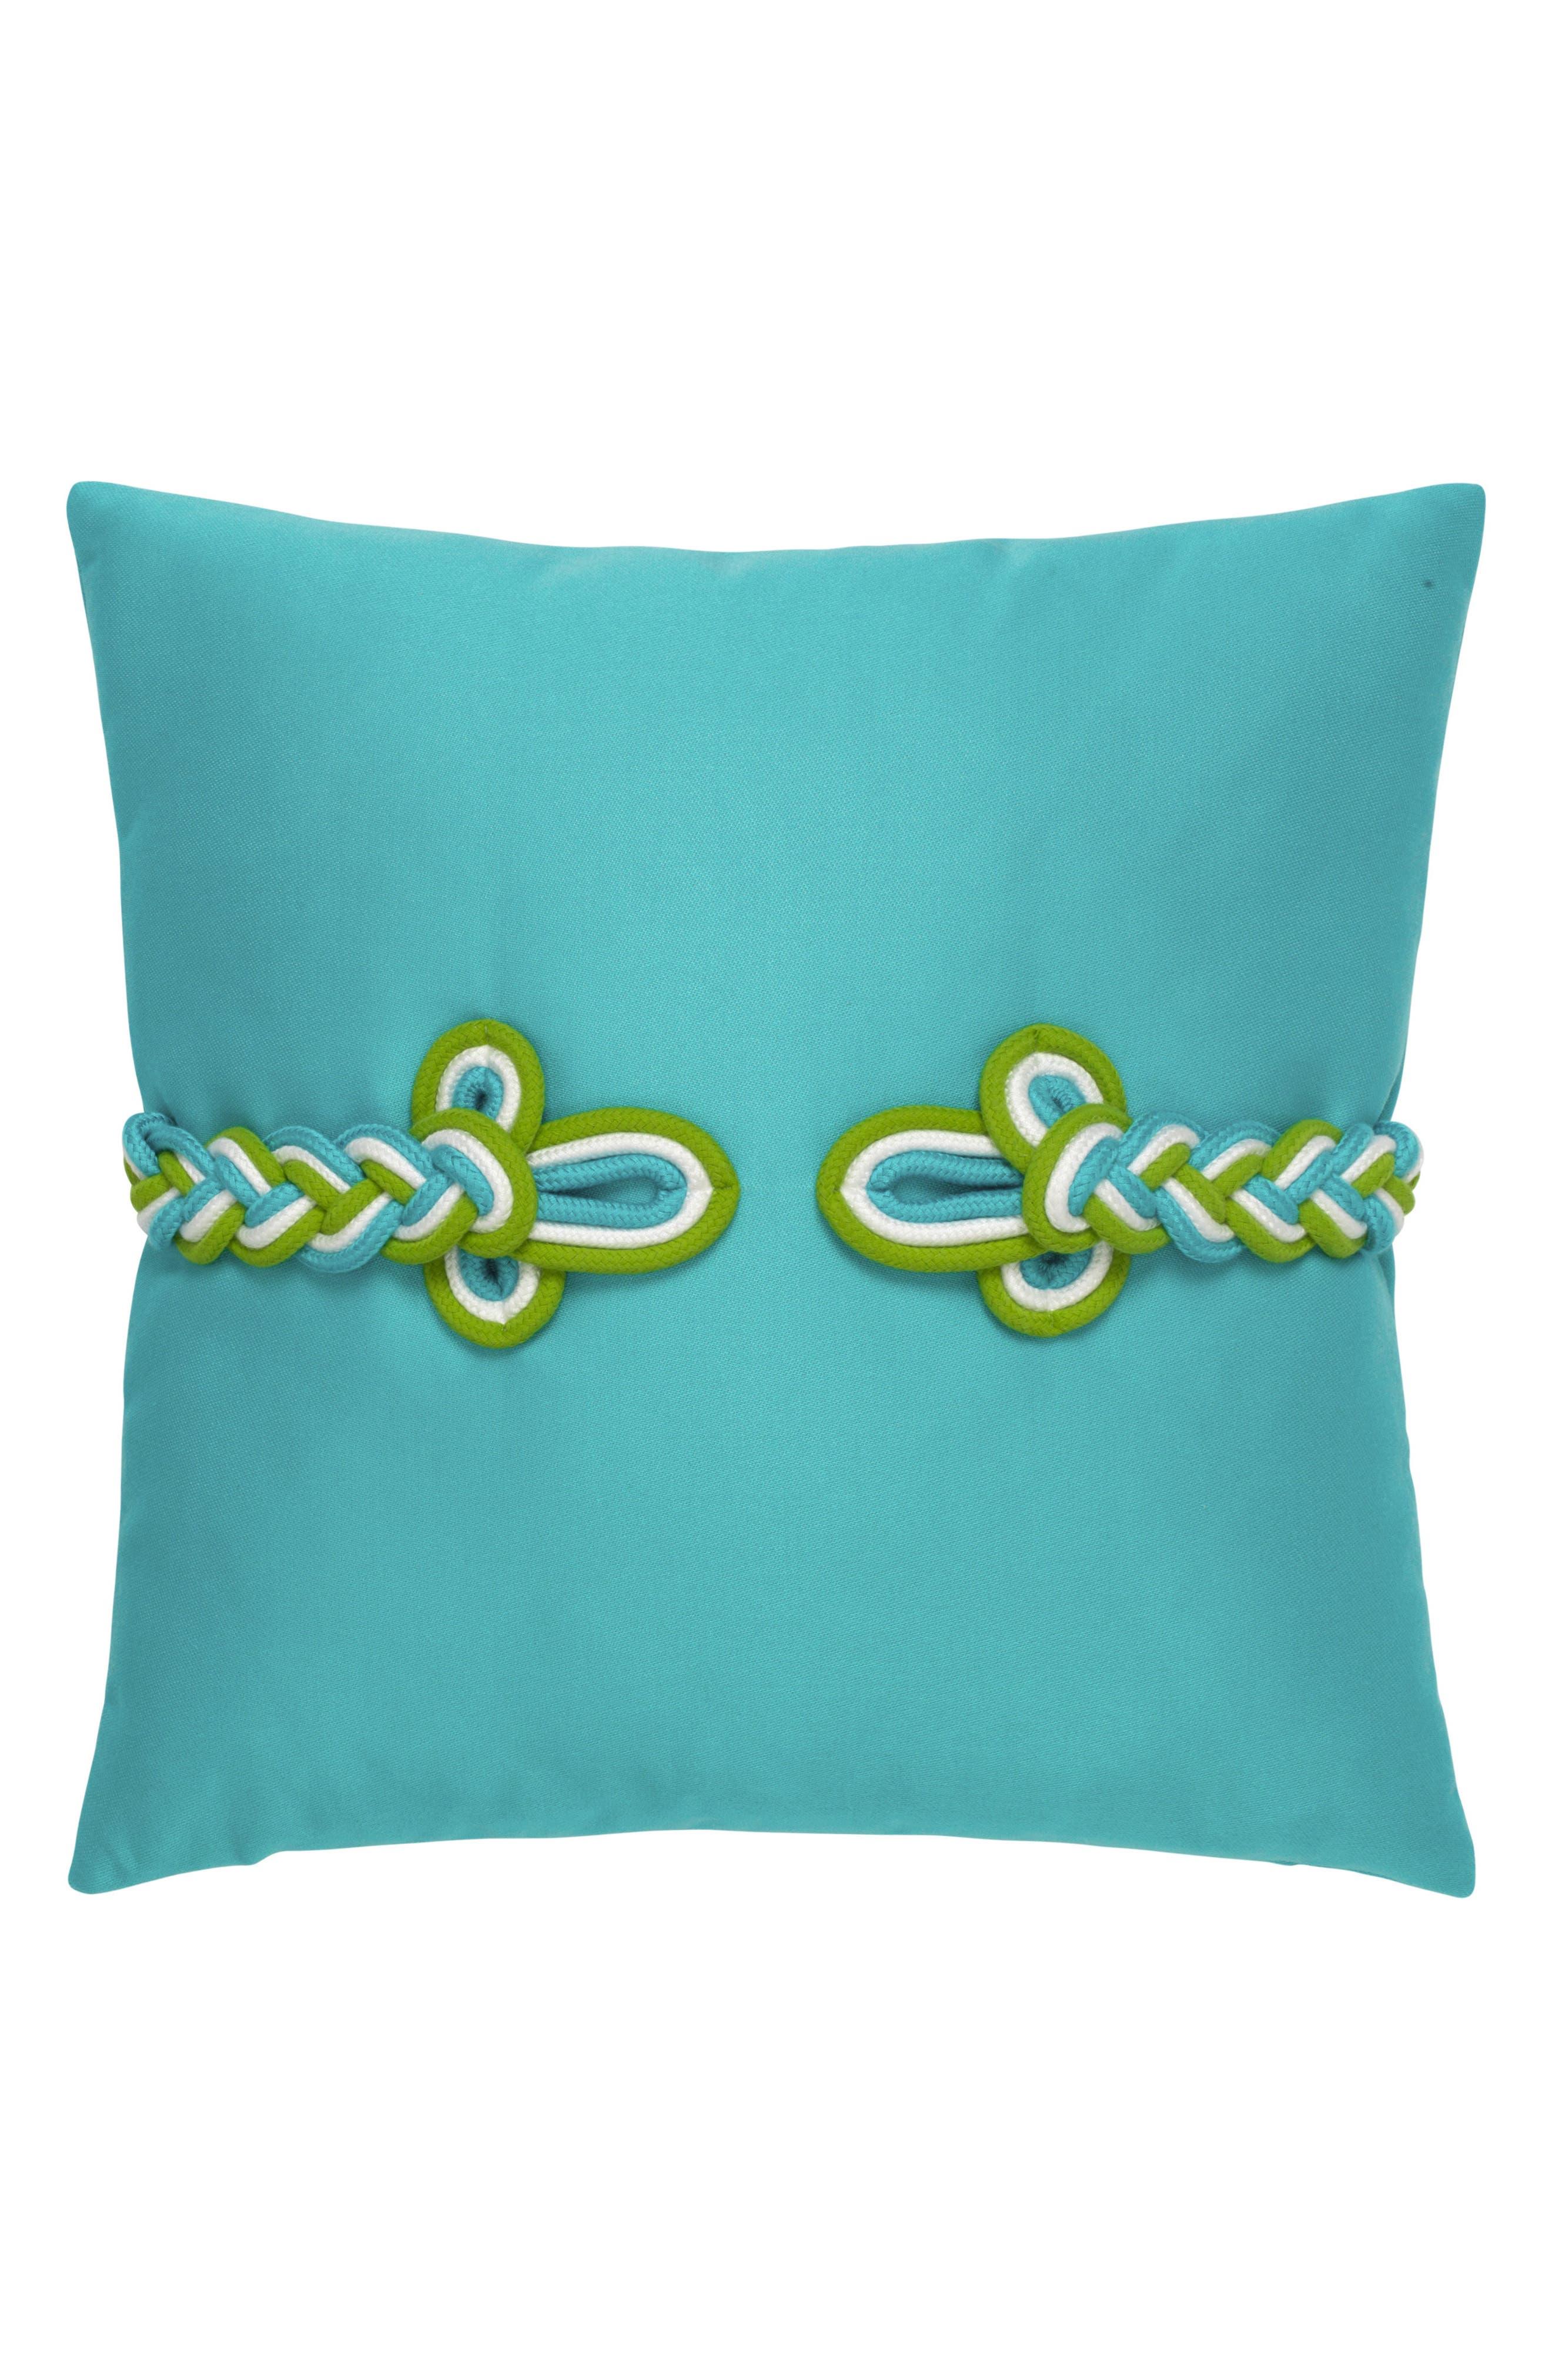 Aruba Frogs Clasp Indoor/Outdoor Accent Pillow,                         Main,                         color, 400